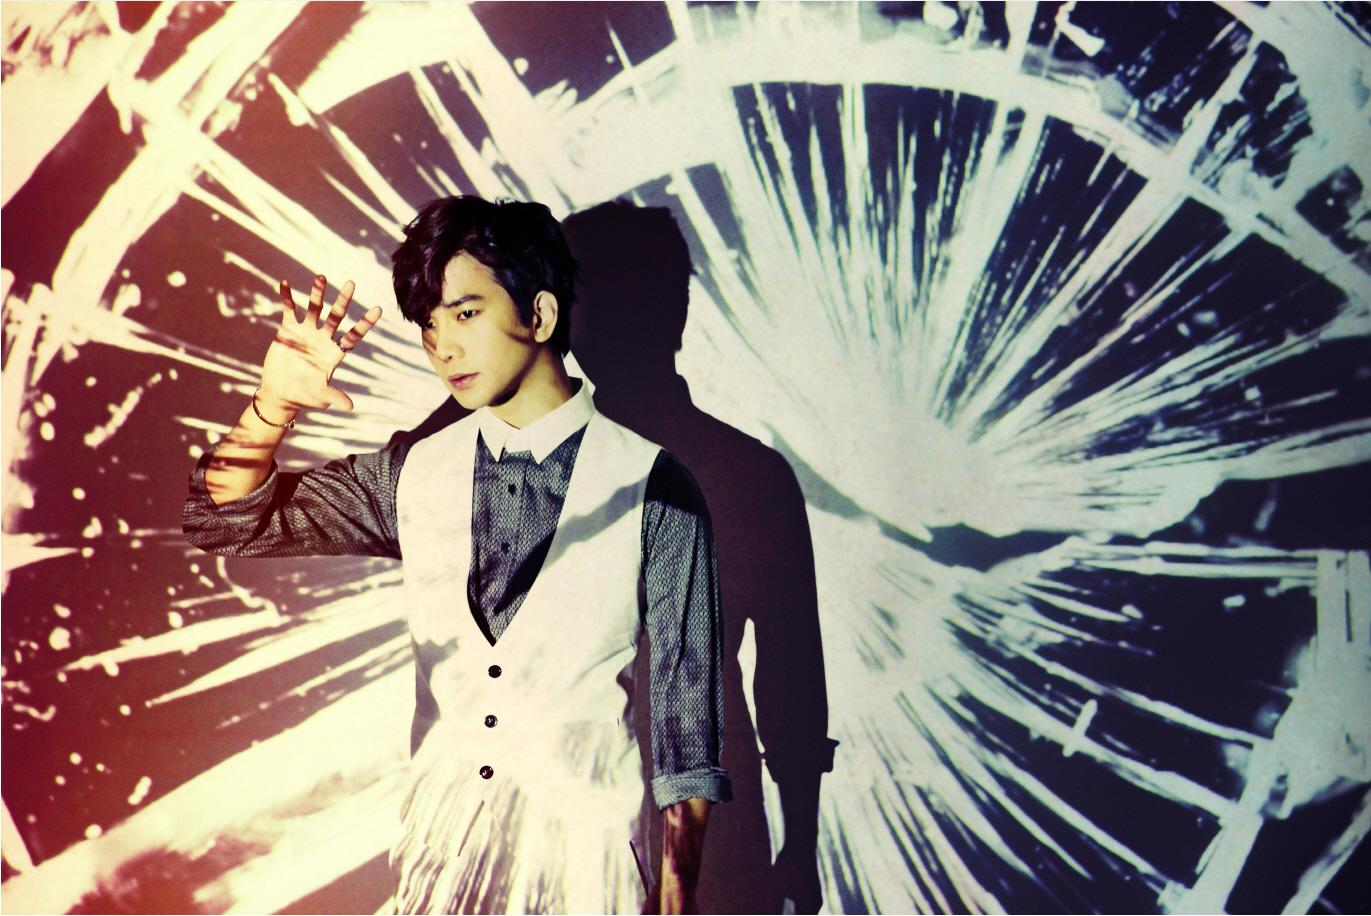 jung yong hwa wallpaper